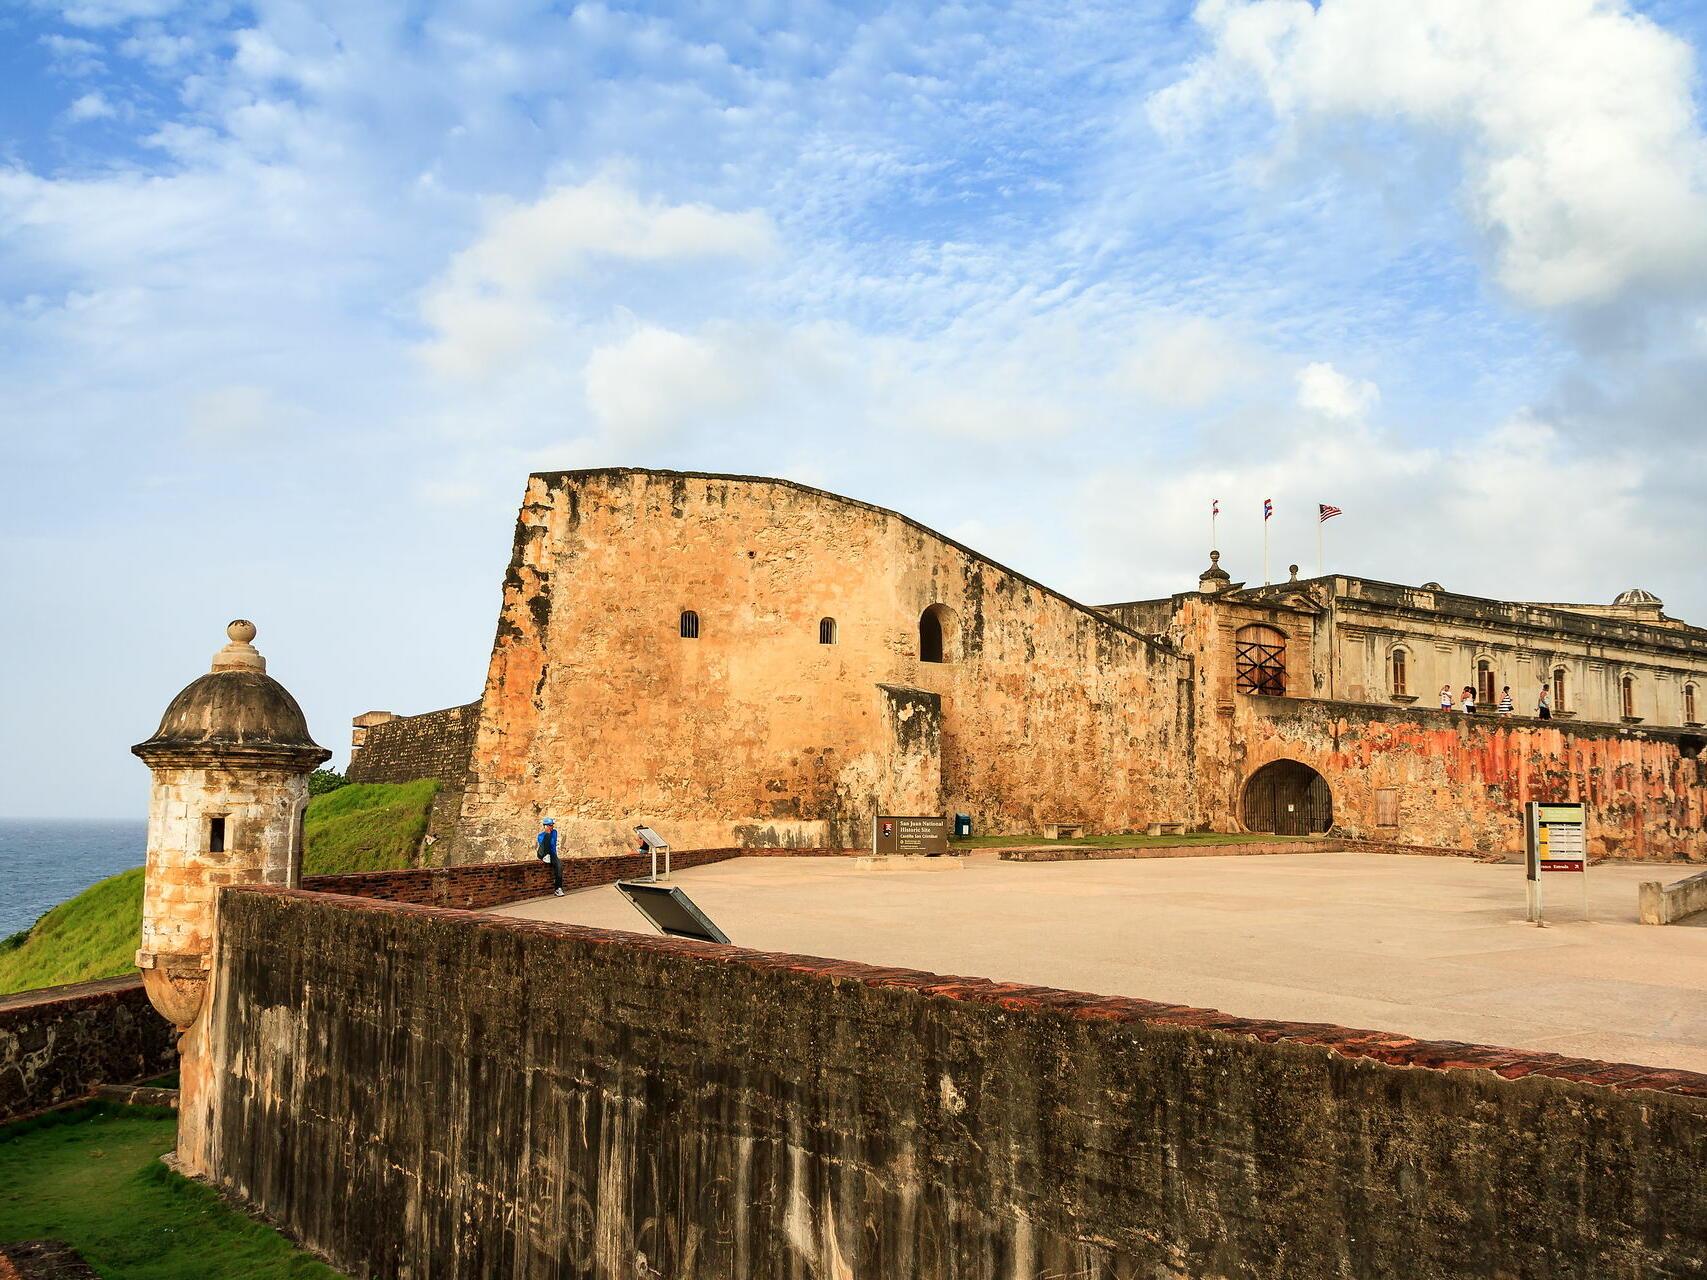 San Cristobal Castle Fort